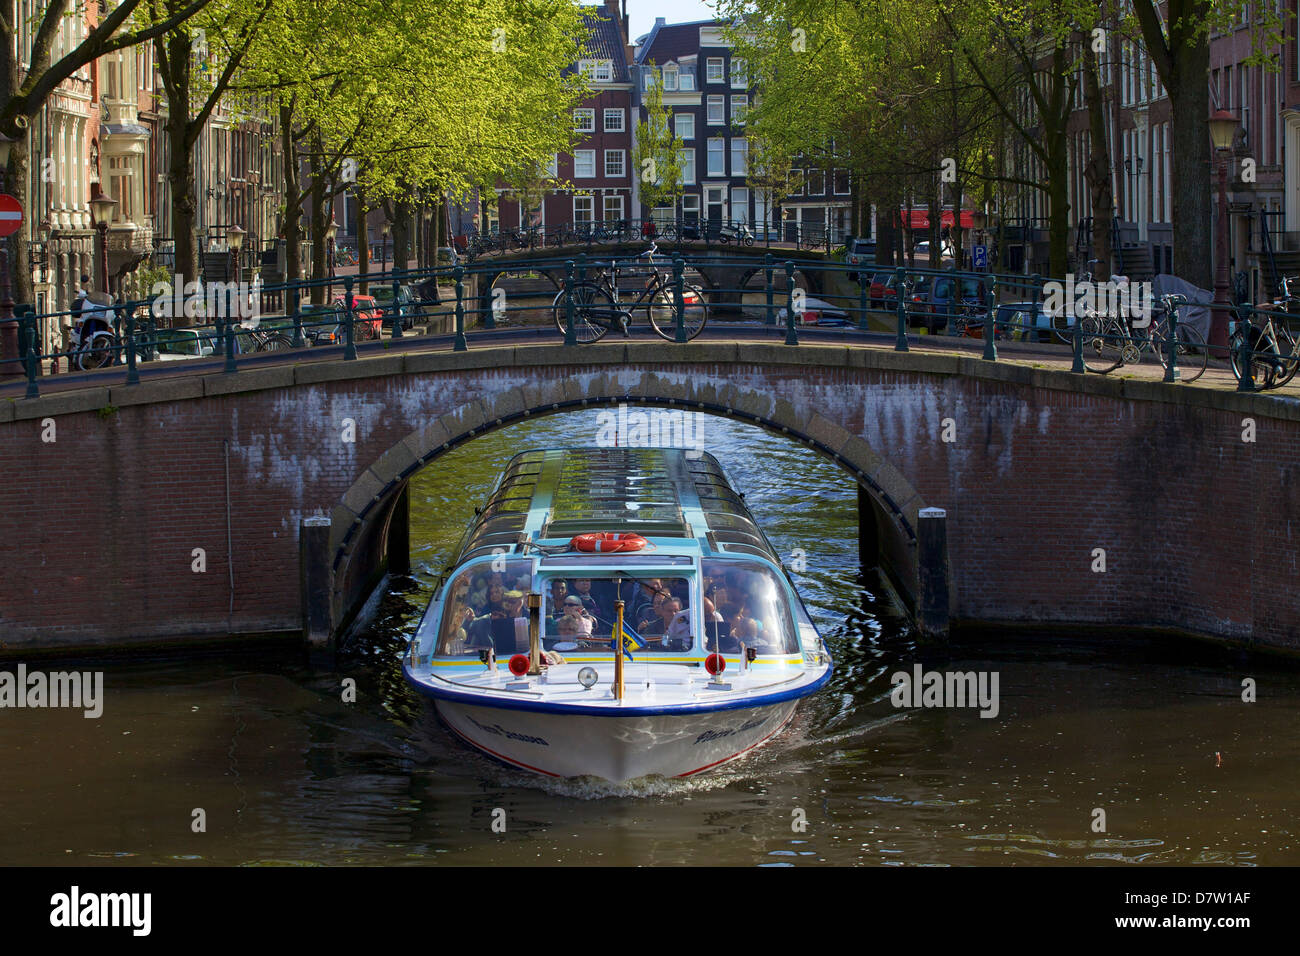 Tourist boat on Keizersgracht, Amsterdam, Netherlands - Stock Image